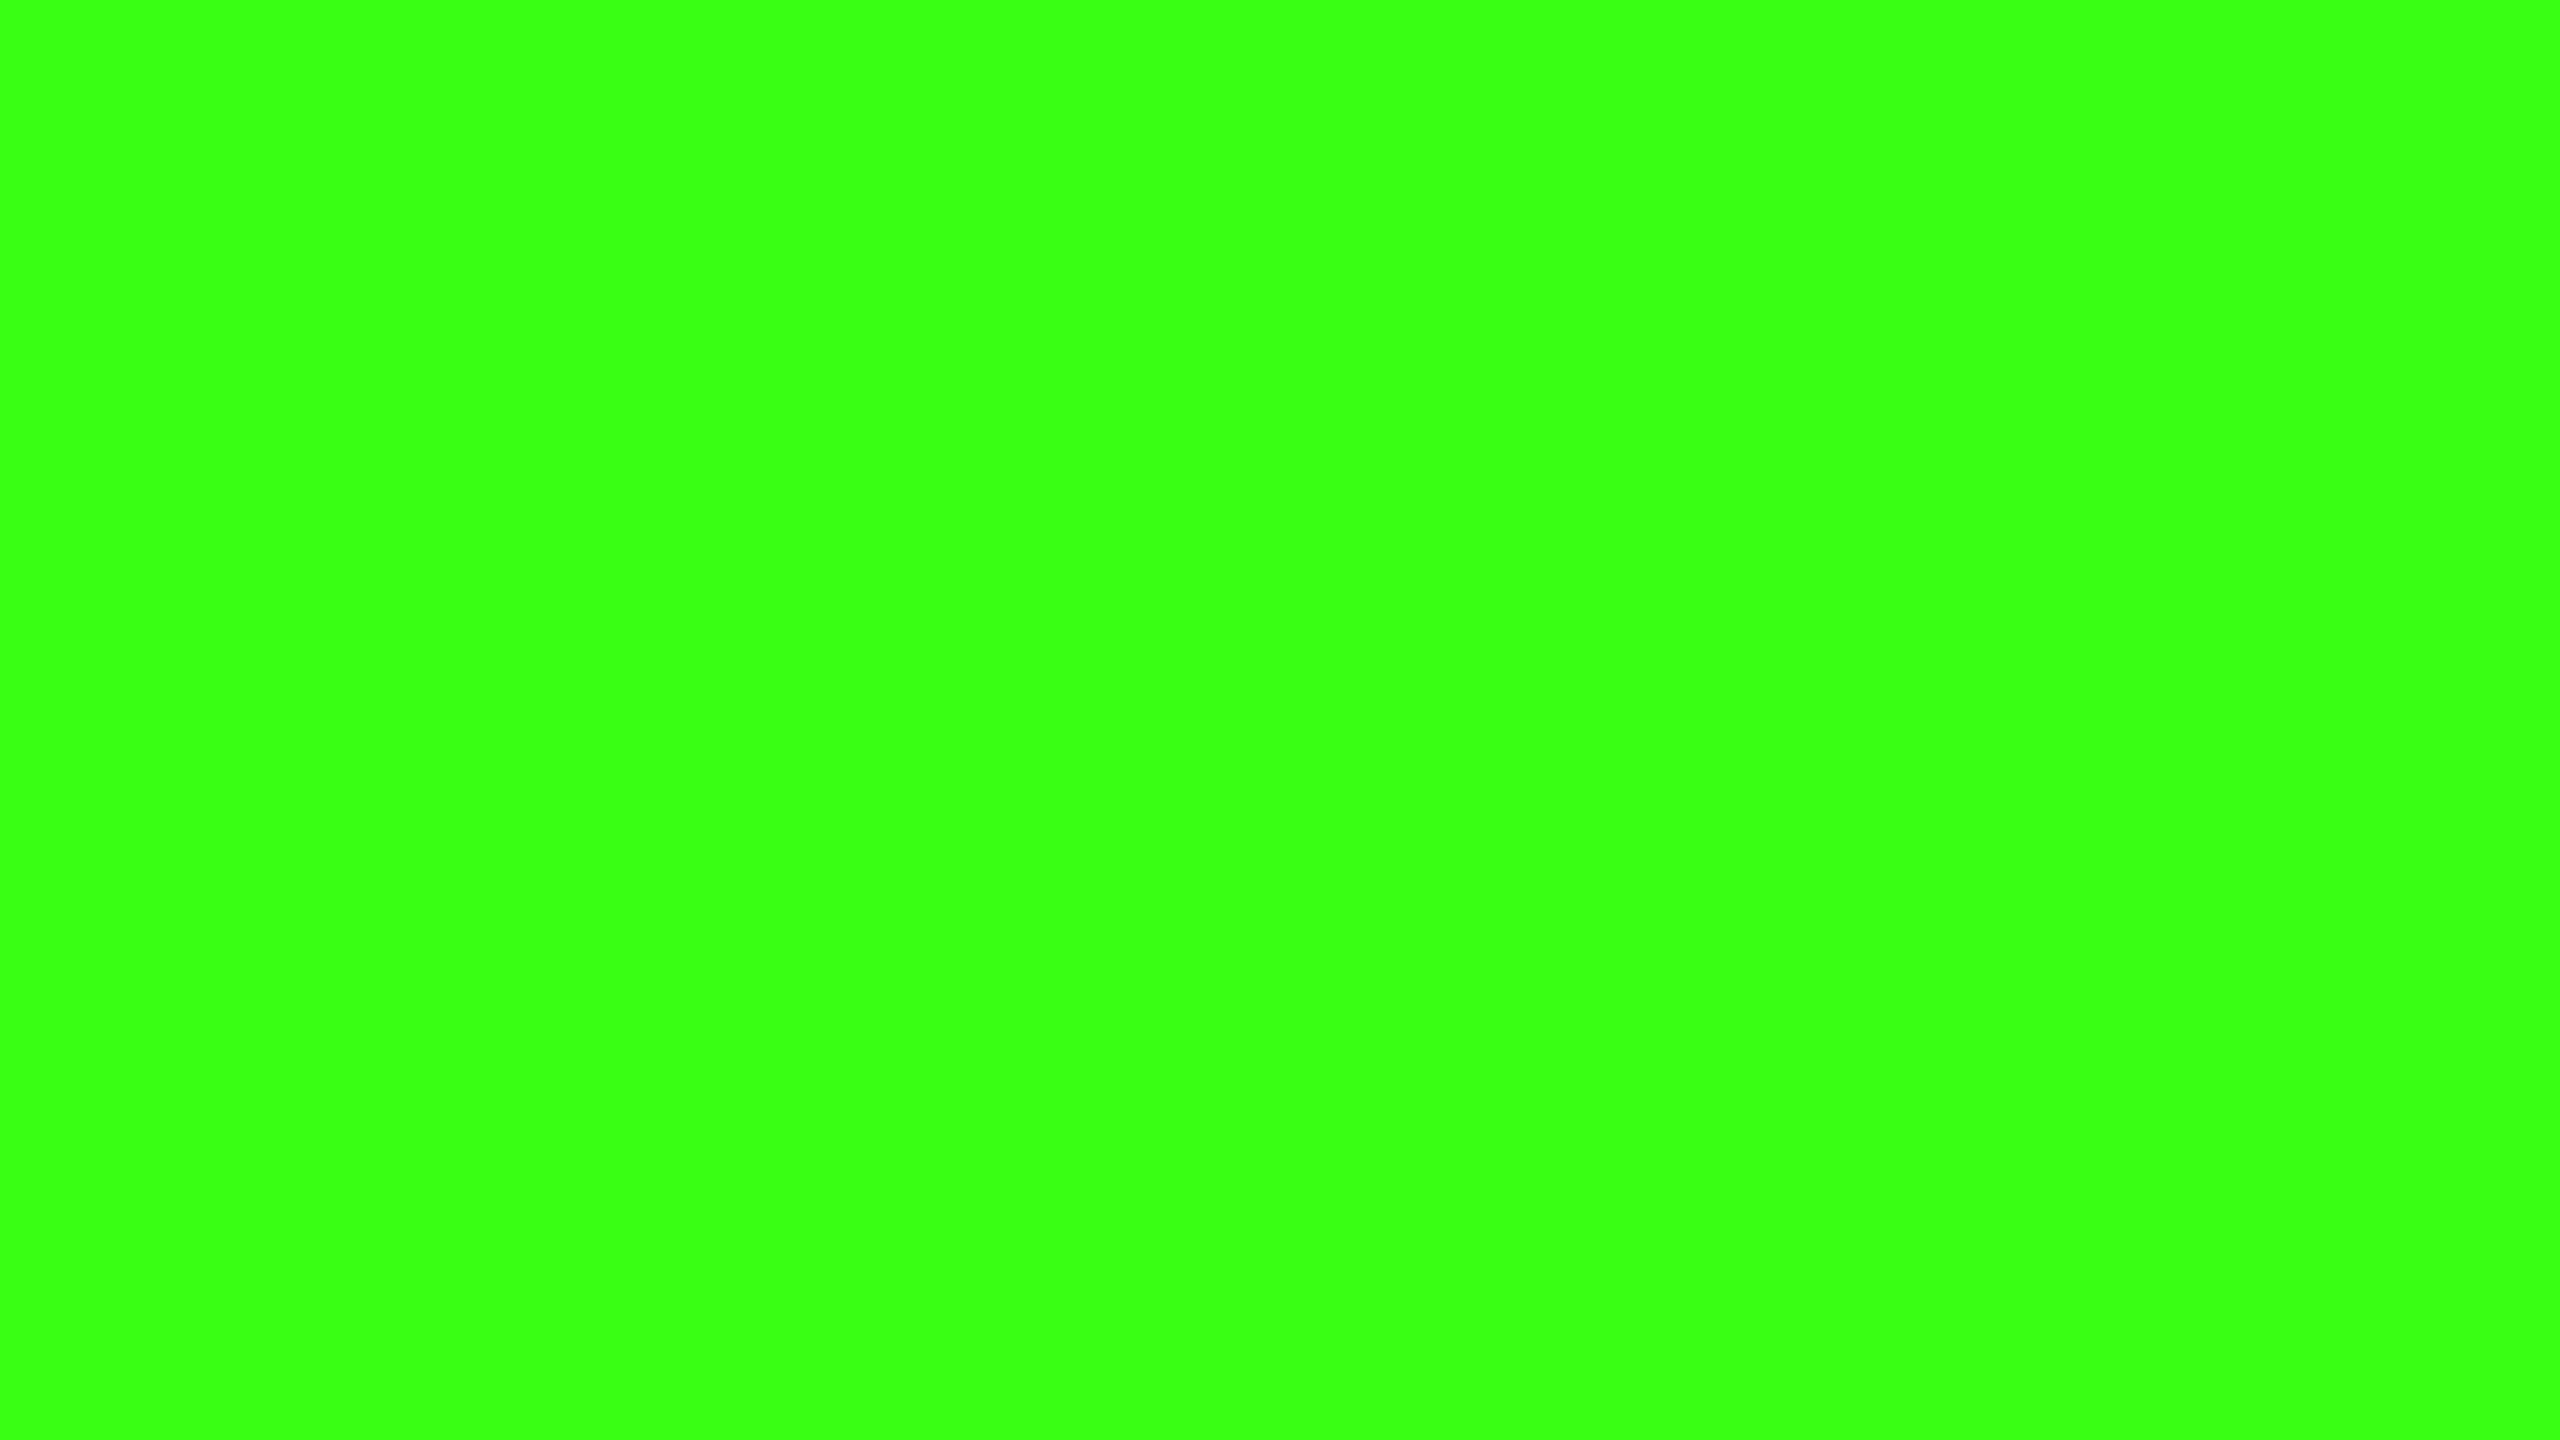 Neon Green Wallpaper HD Wallpapers on picsfaircom 2560x1440